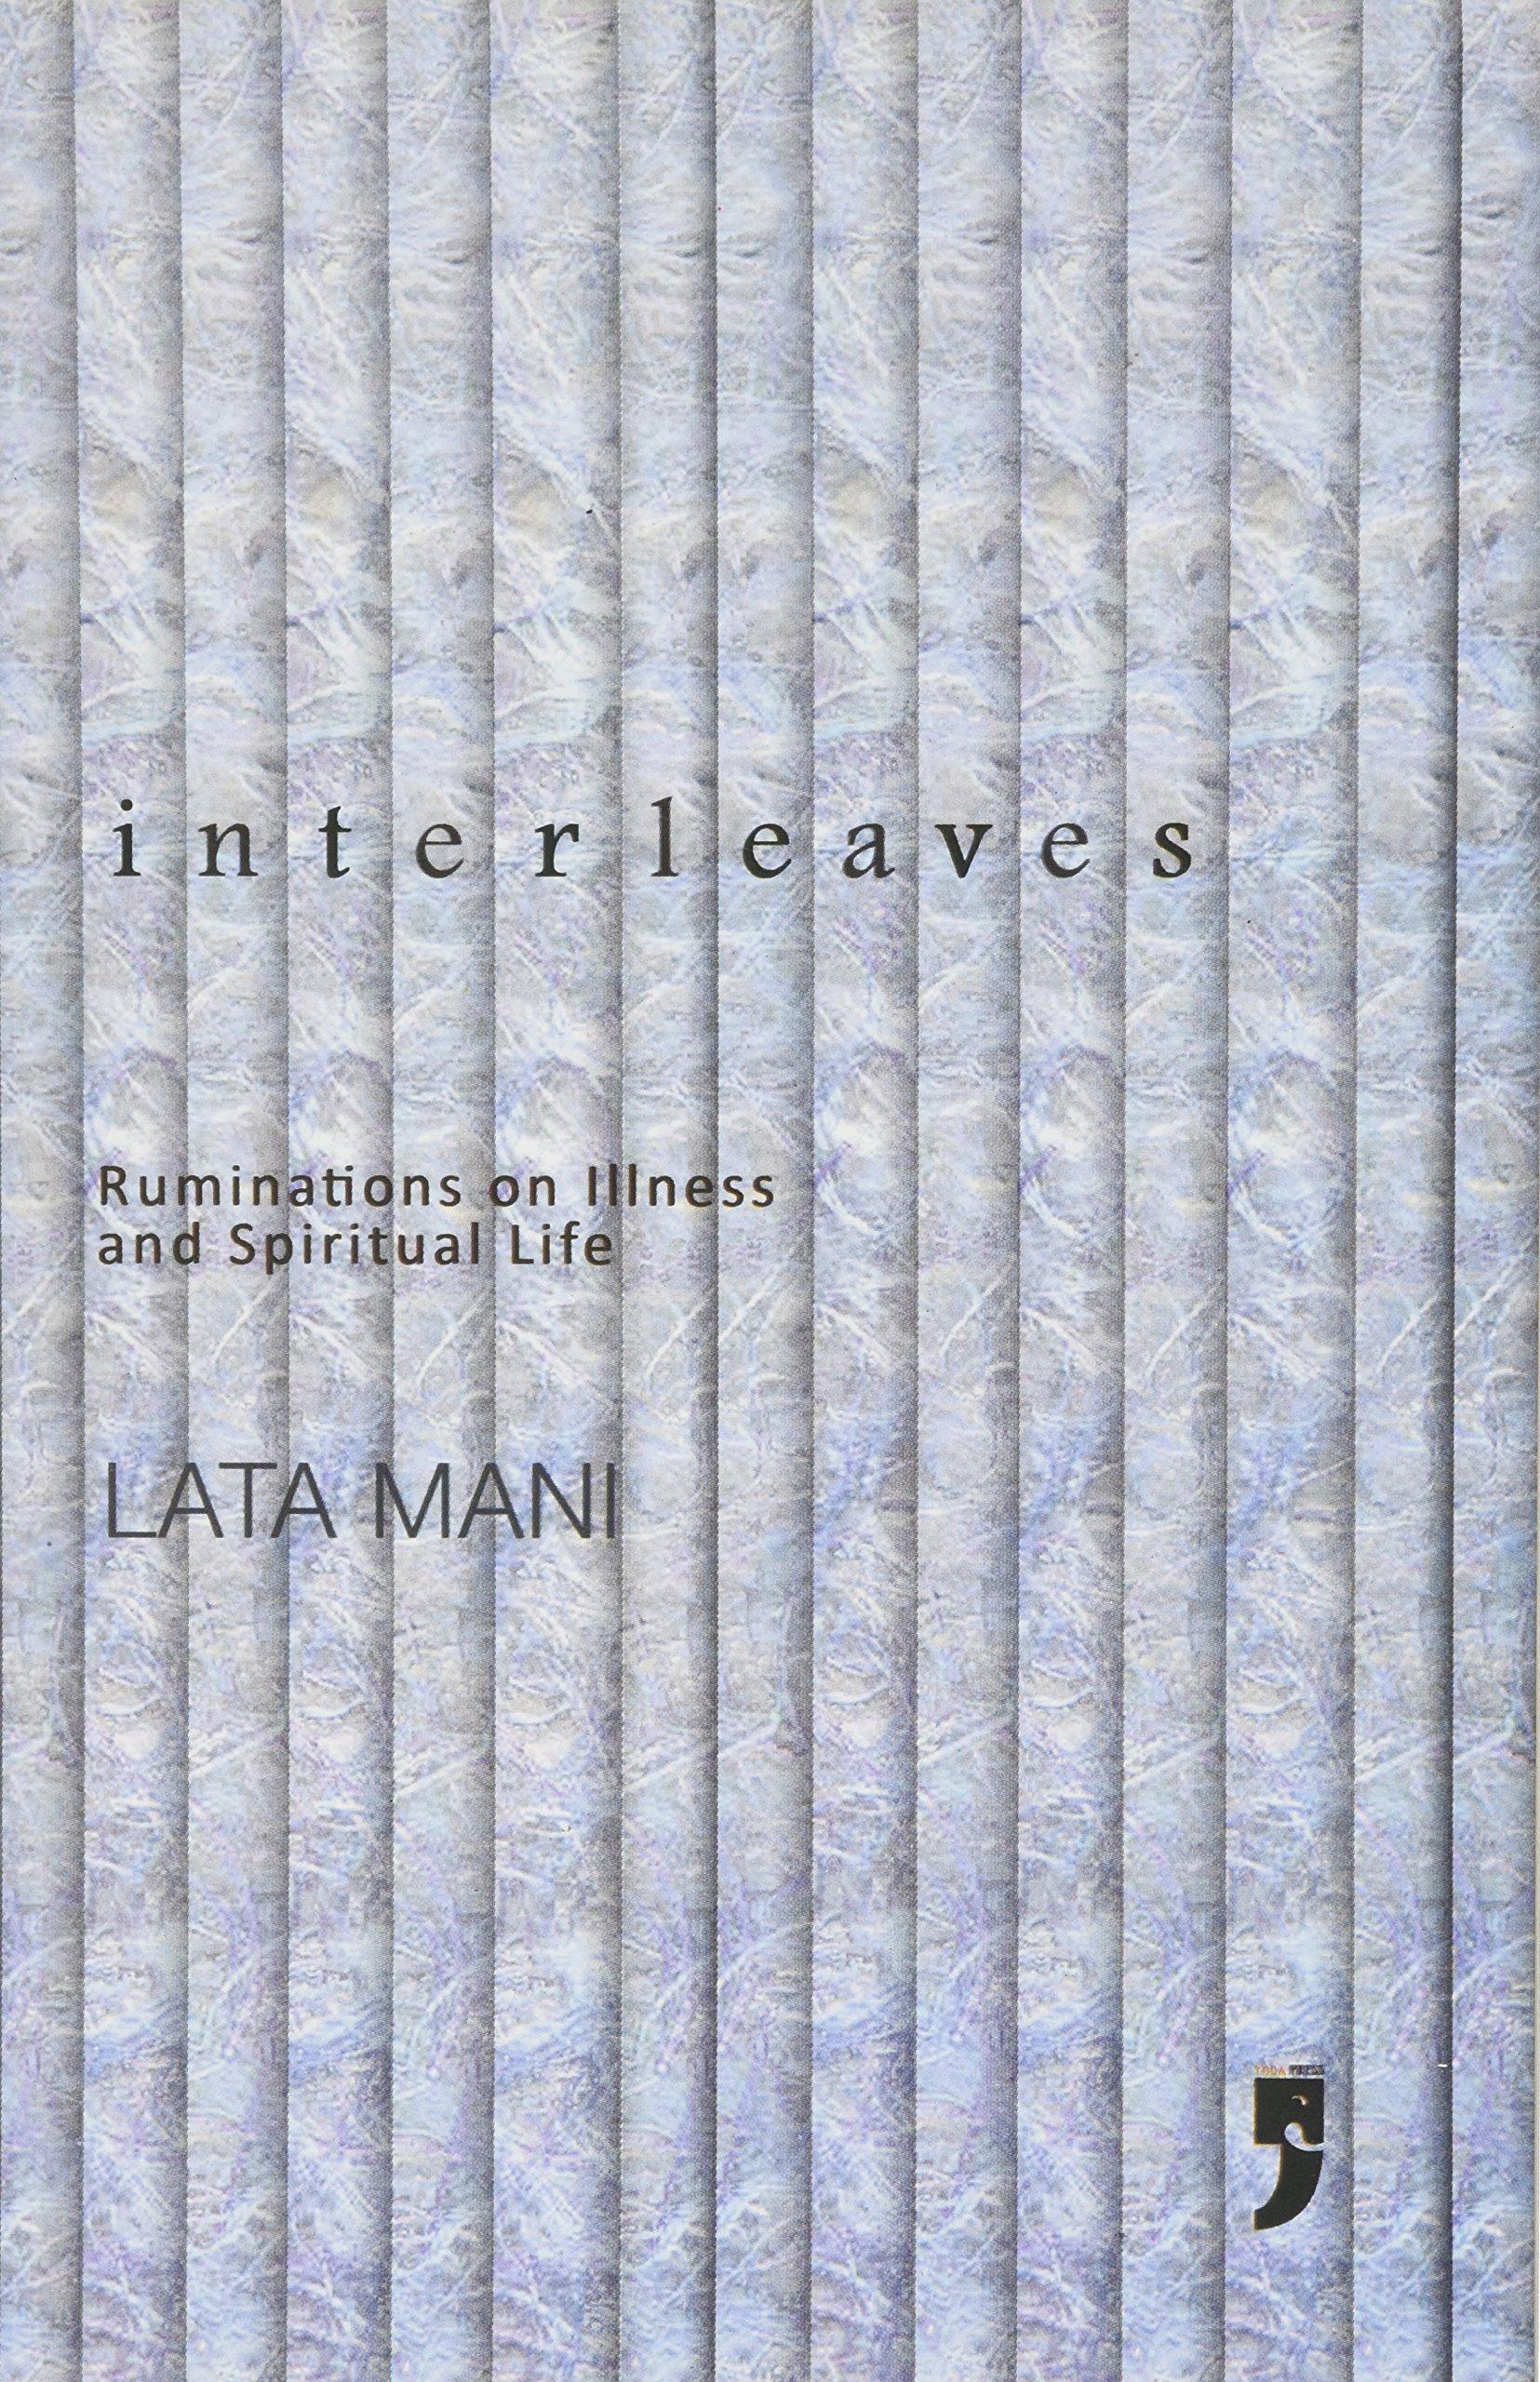 Download Interleaves: Ruminations on Illness and Spiritual Life pdf epub